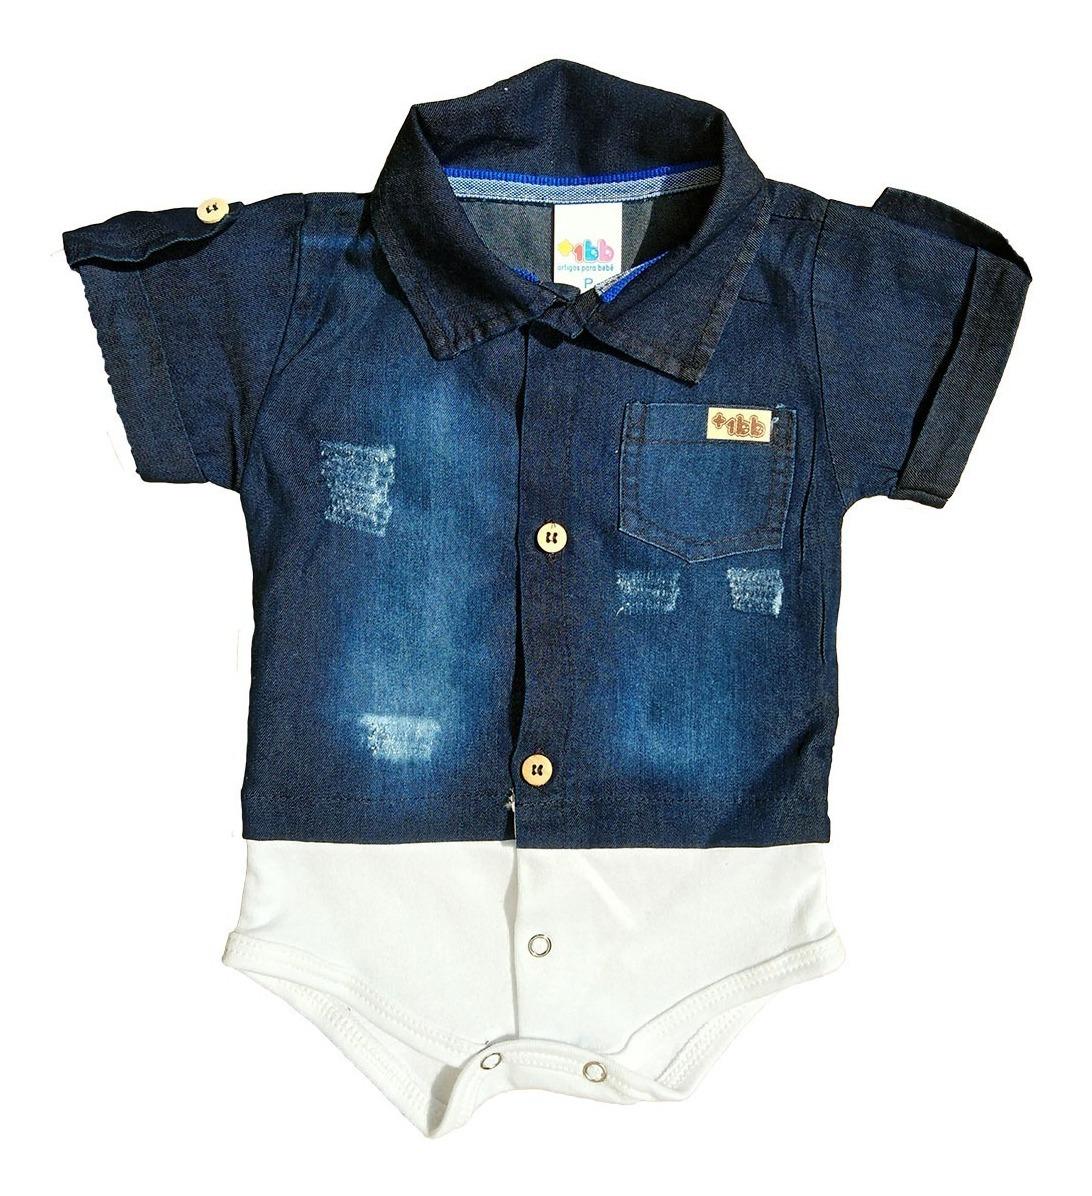 af59b71b417a body camisa para bebês manga curta jeans - masculino. Carregando zoom.